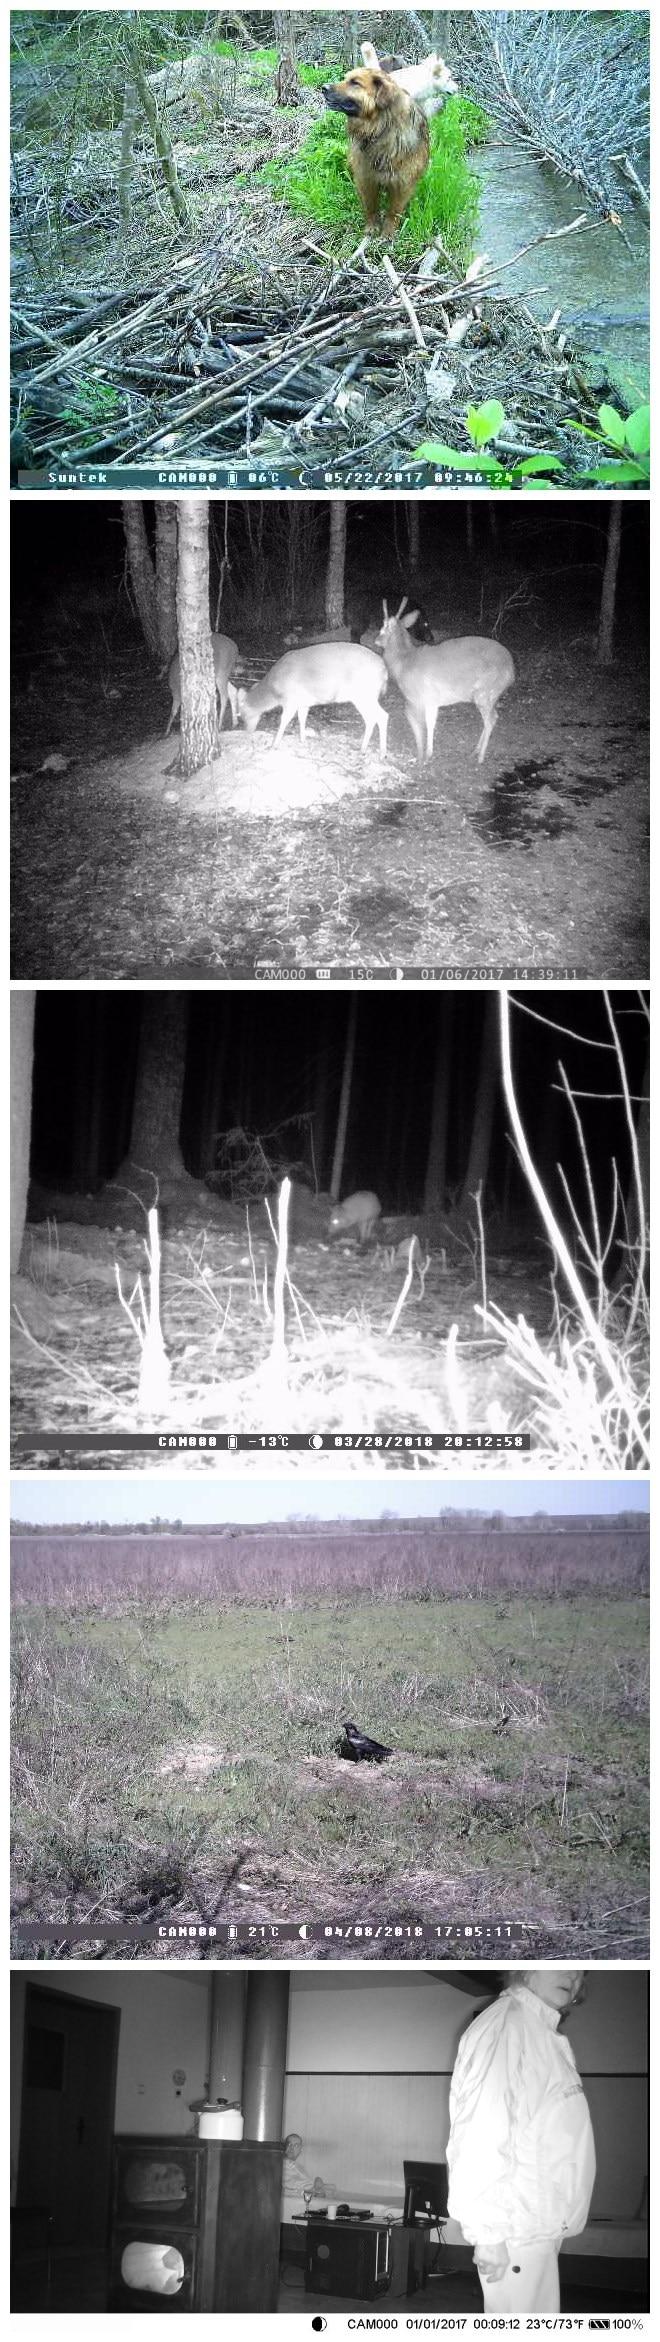 Suntek hunting camera